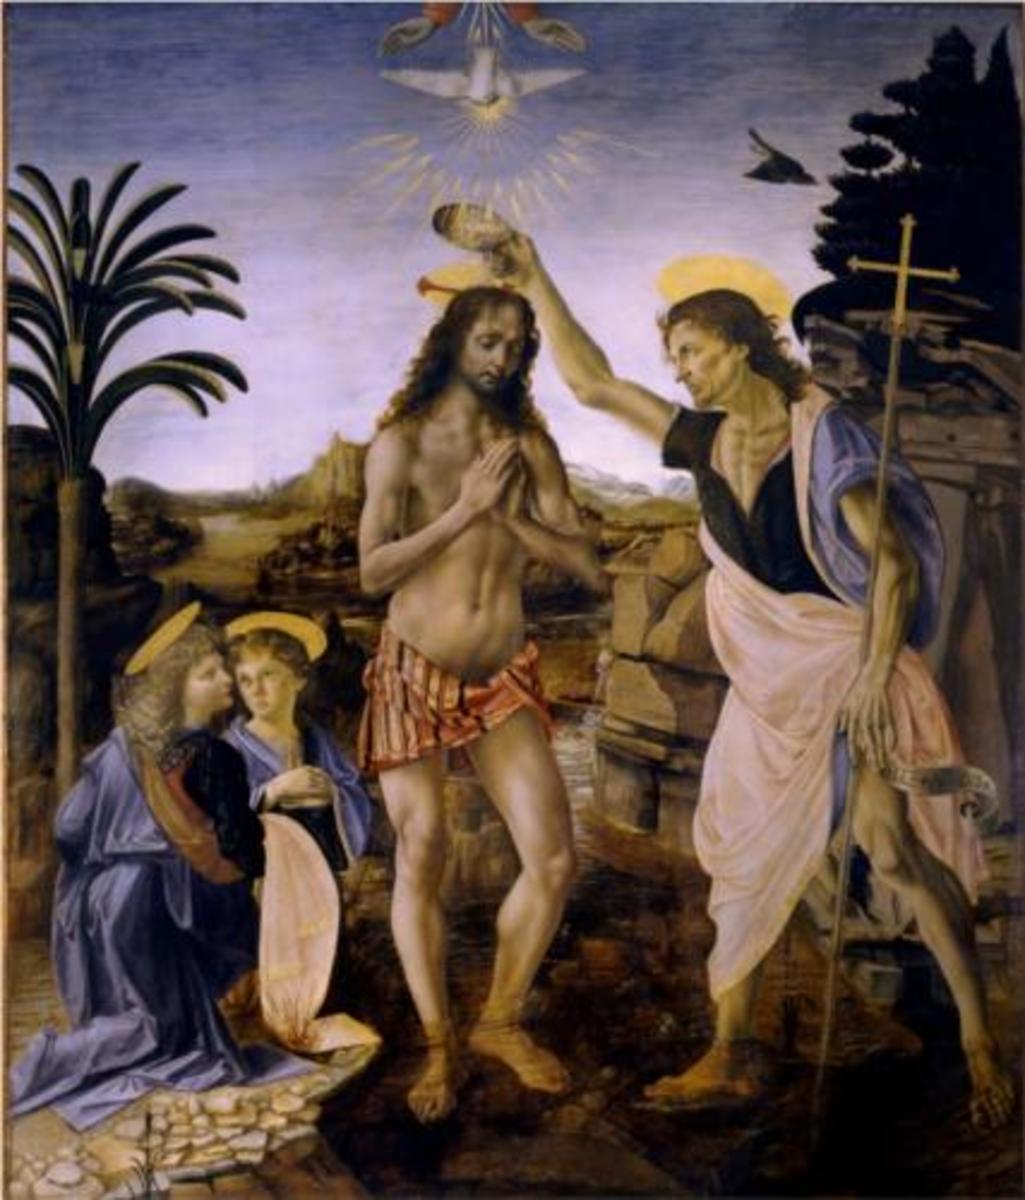 Andrea del Verrochio's Baptism of Christ. Leonardo da Vinci painted the angel of the extreme left.